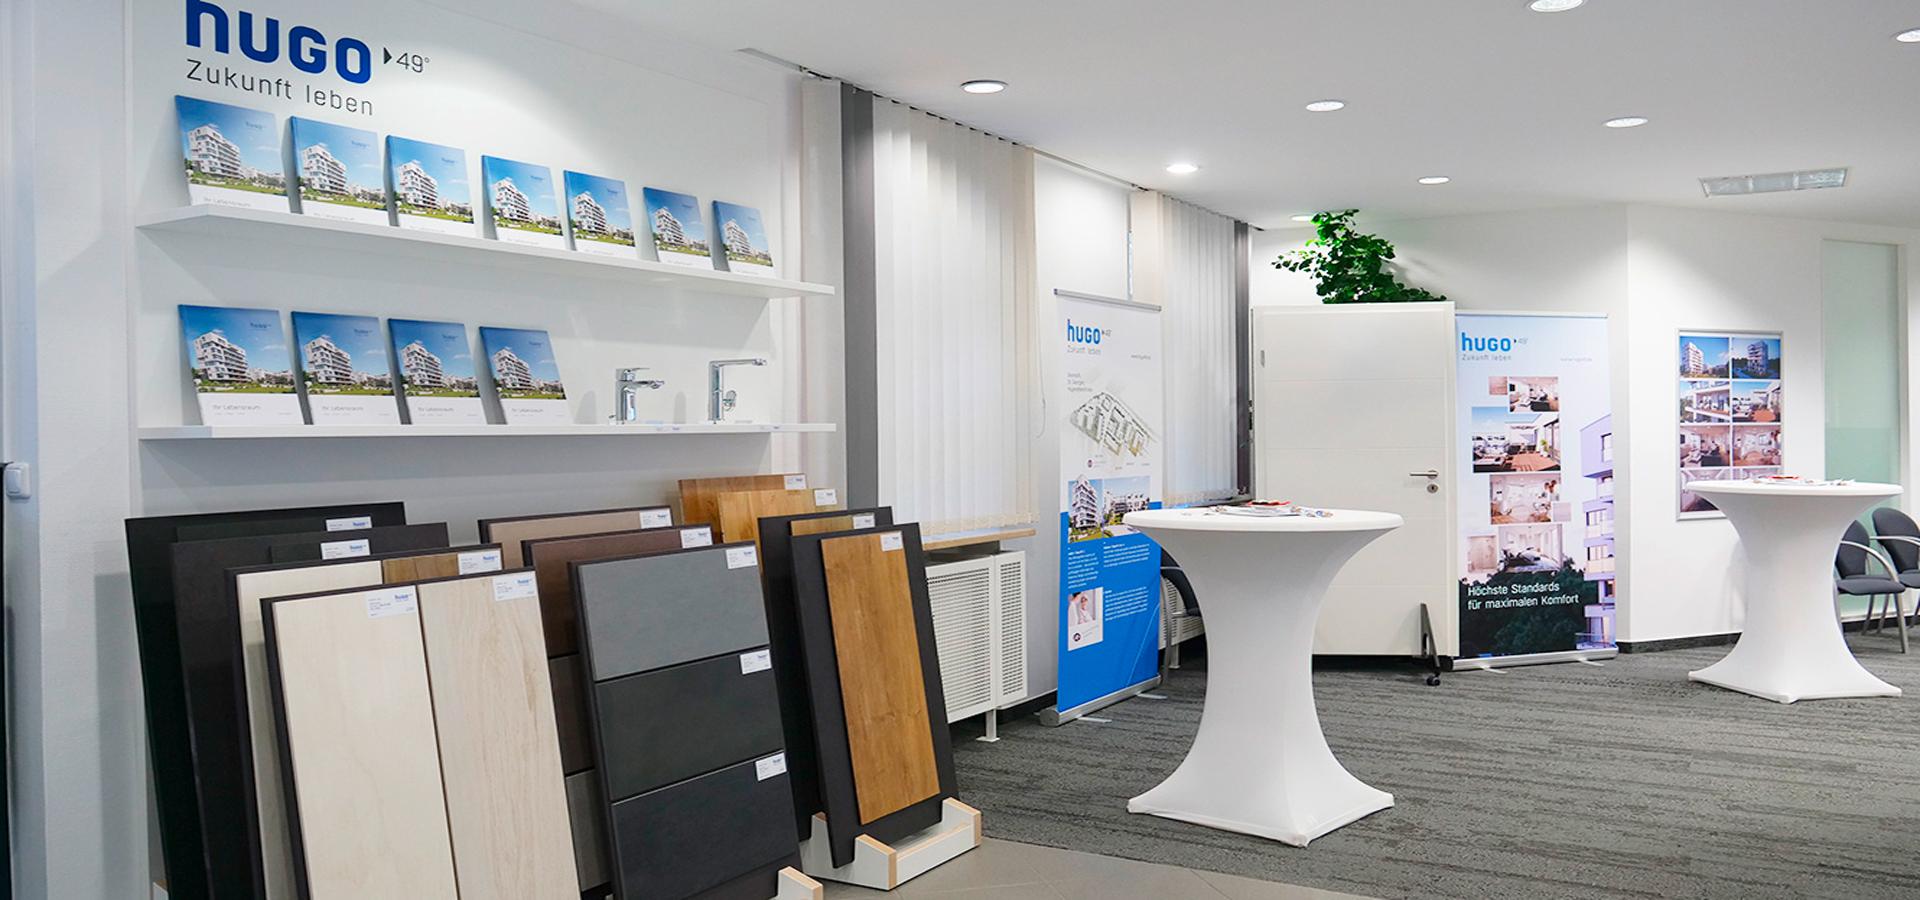 OPUS Marketing / Immobilienmarketing / Showroom hugo49